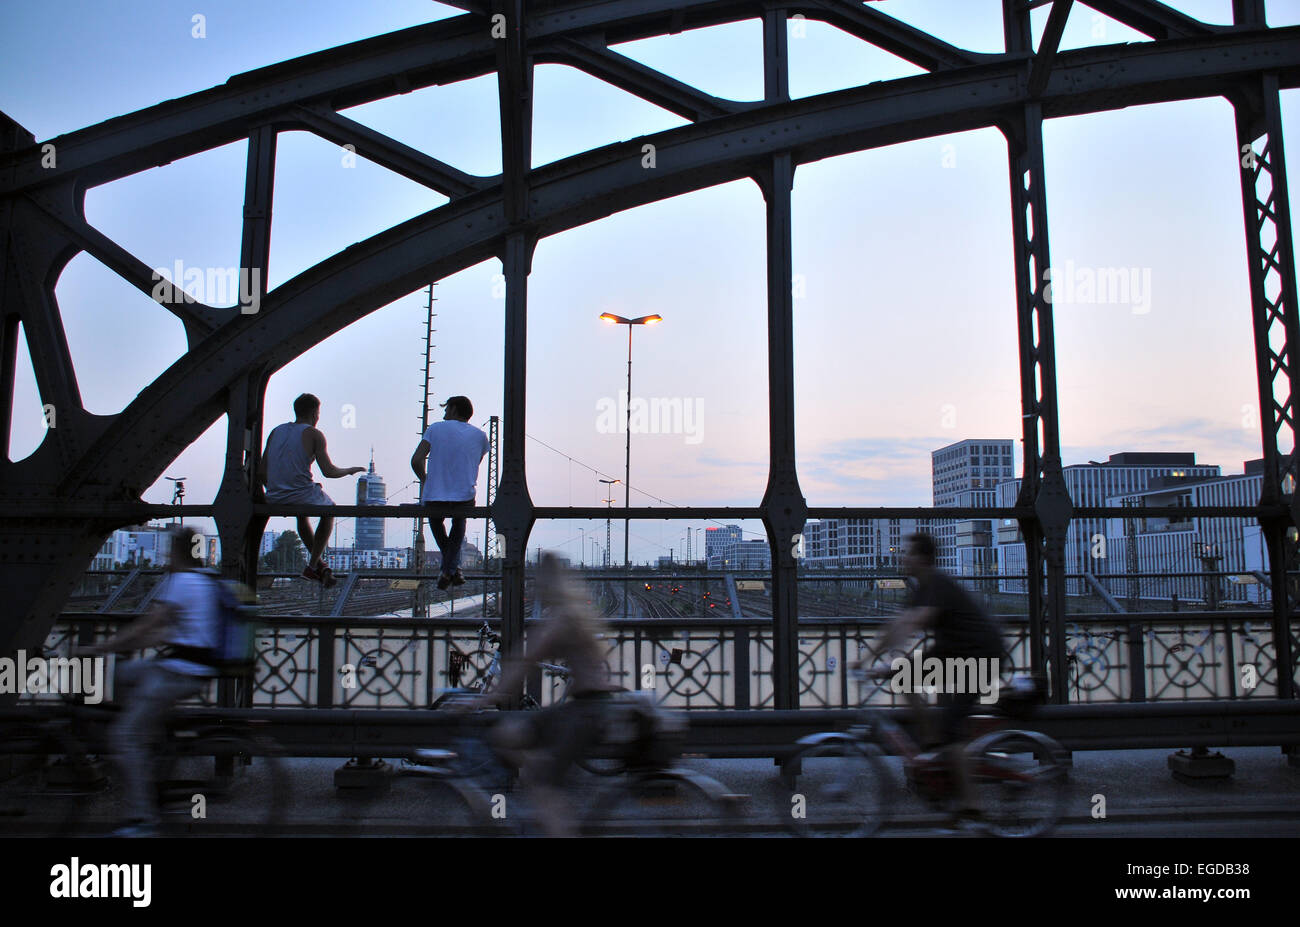 Evening on the Hacker bridge, Munich, Bavaria, Germany - Stock Image